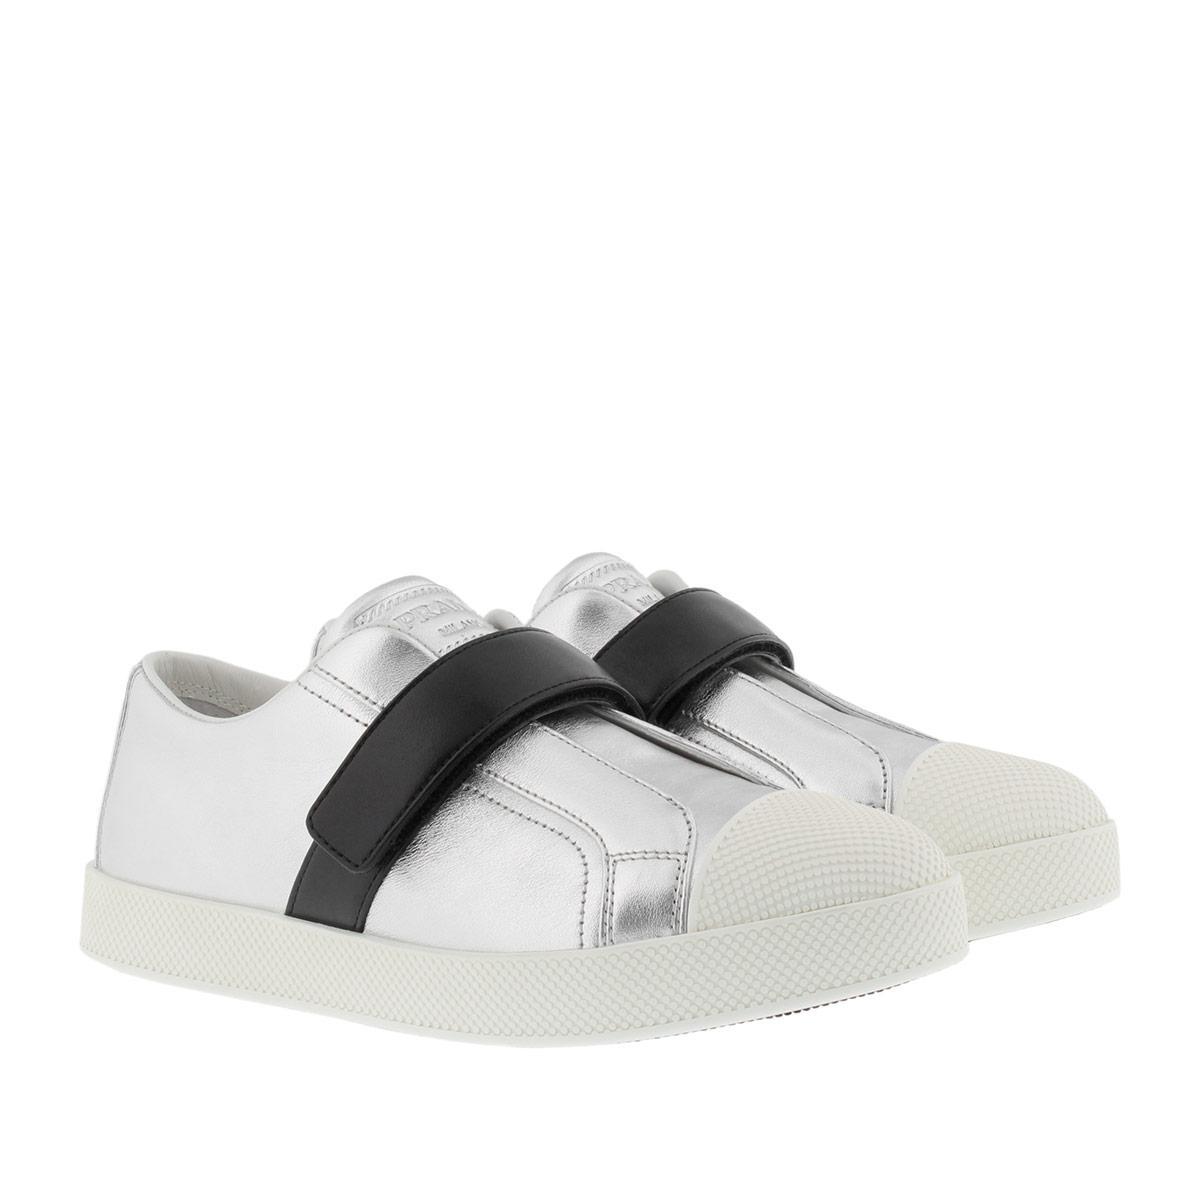 Sneakers - Calzature Donna Vitello Soft Sneaker Black/White - black - Sneakers for ladies Prada qsfKq